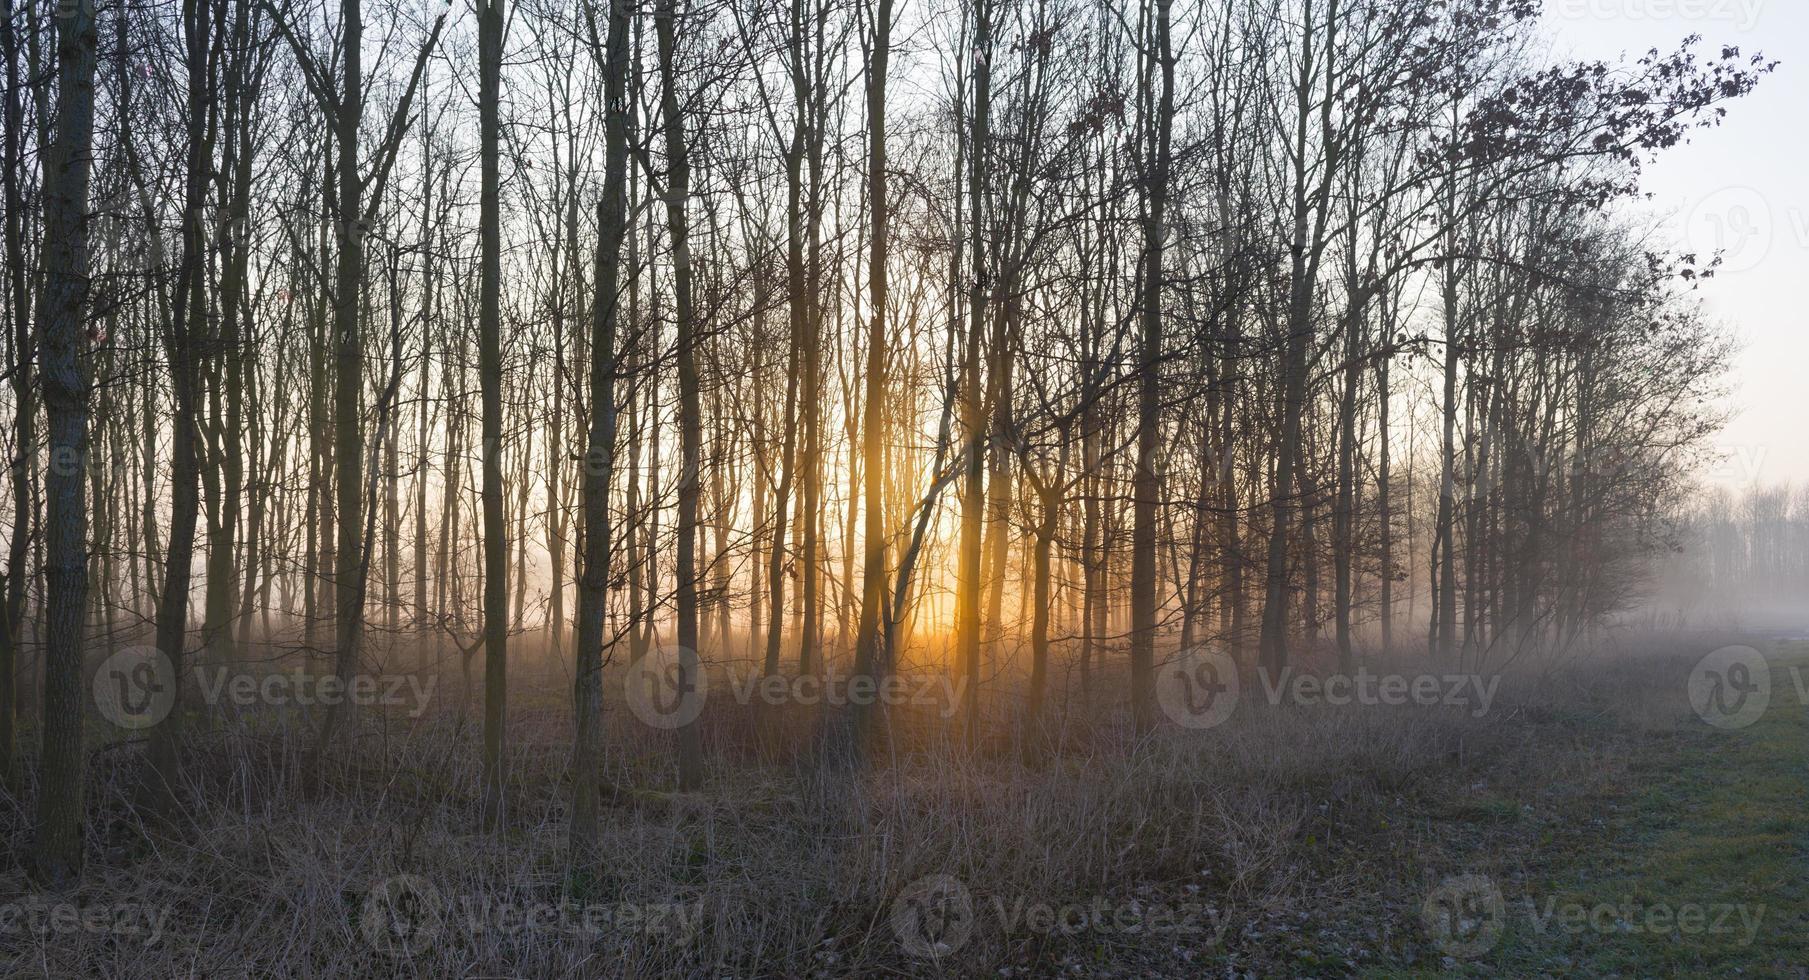 zonsopgang in een mistig bos in de winter foto